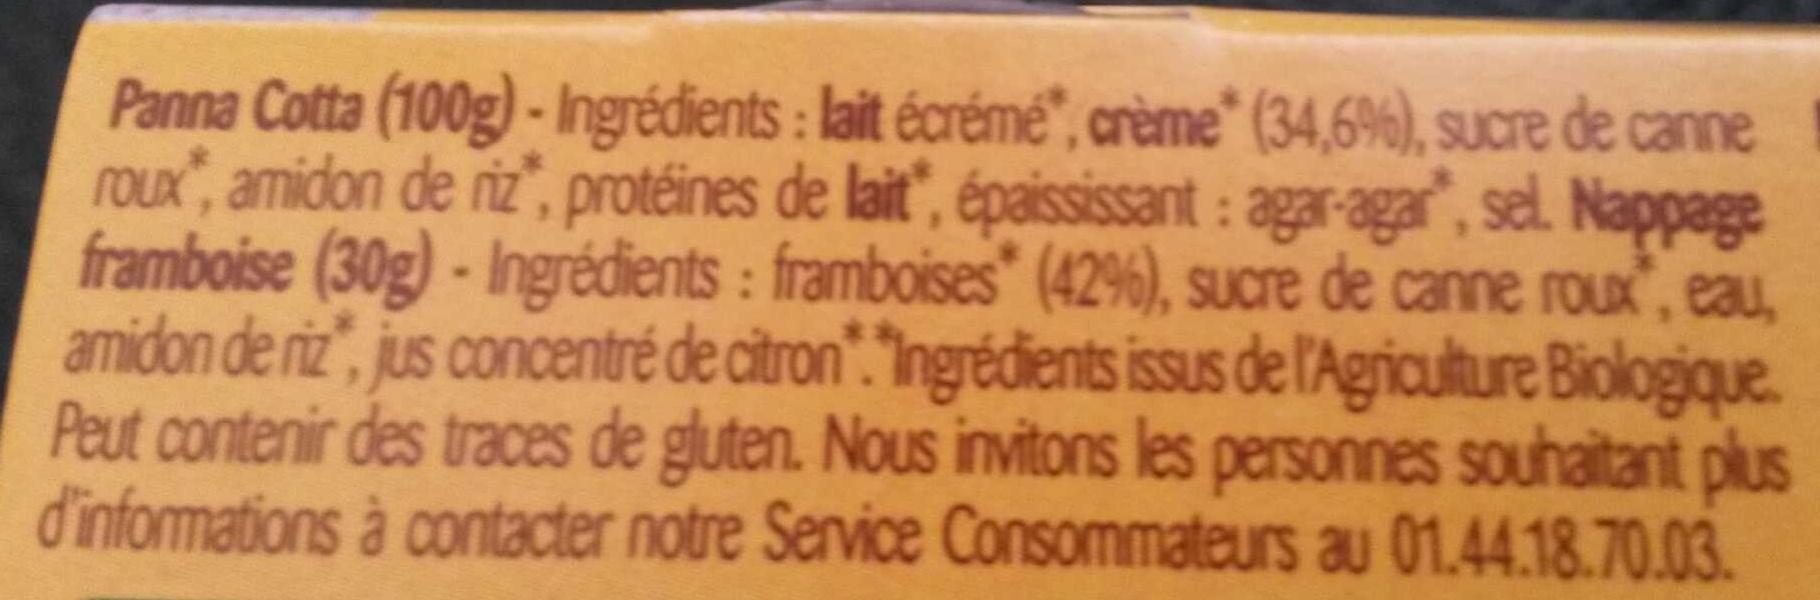 Panna Cotta Framboise - Ingredients - fr